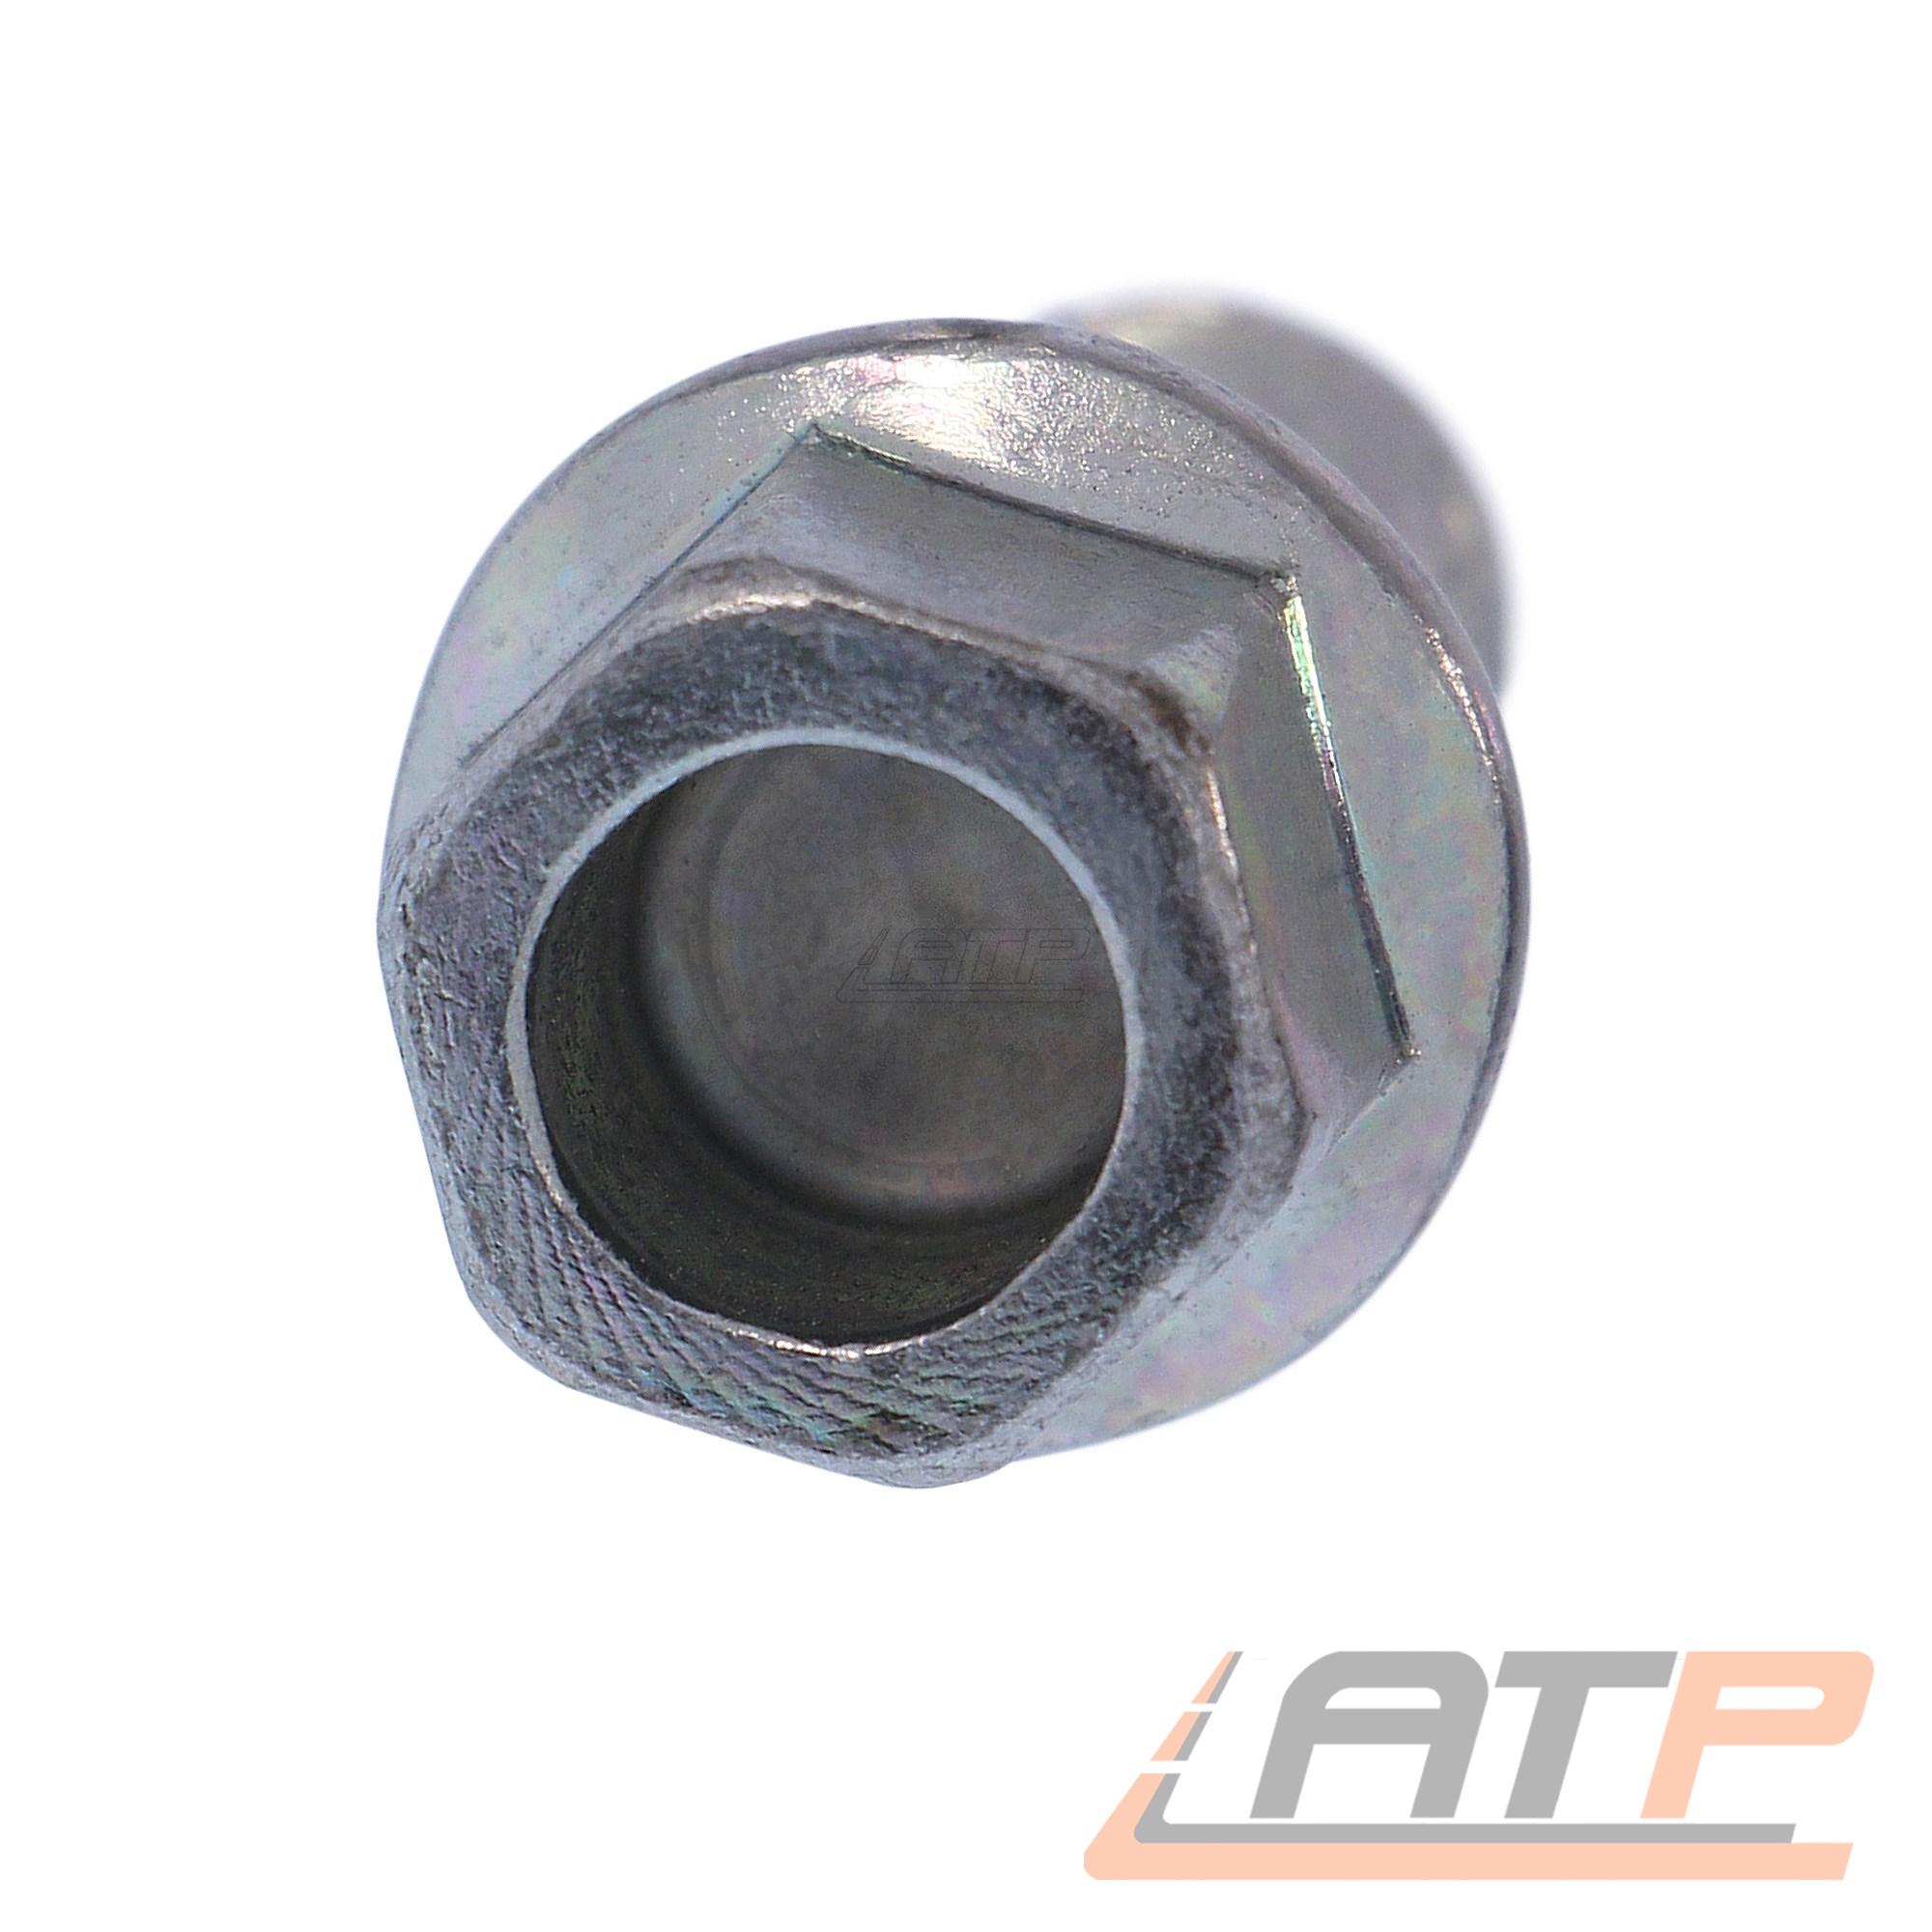 4x Febi bilstein perno de rueda m14x1,5x27 mm sw17 bala Bala federal tornillo 31880859